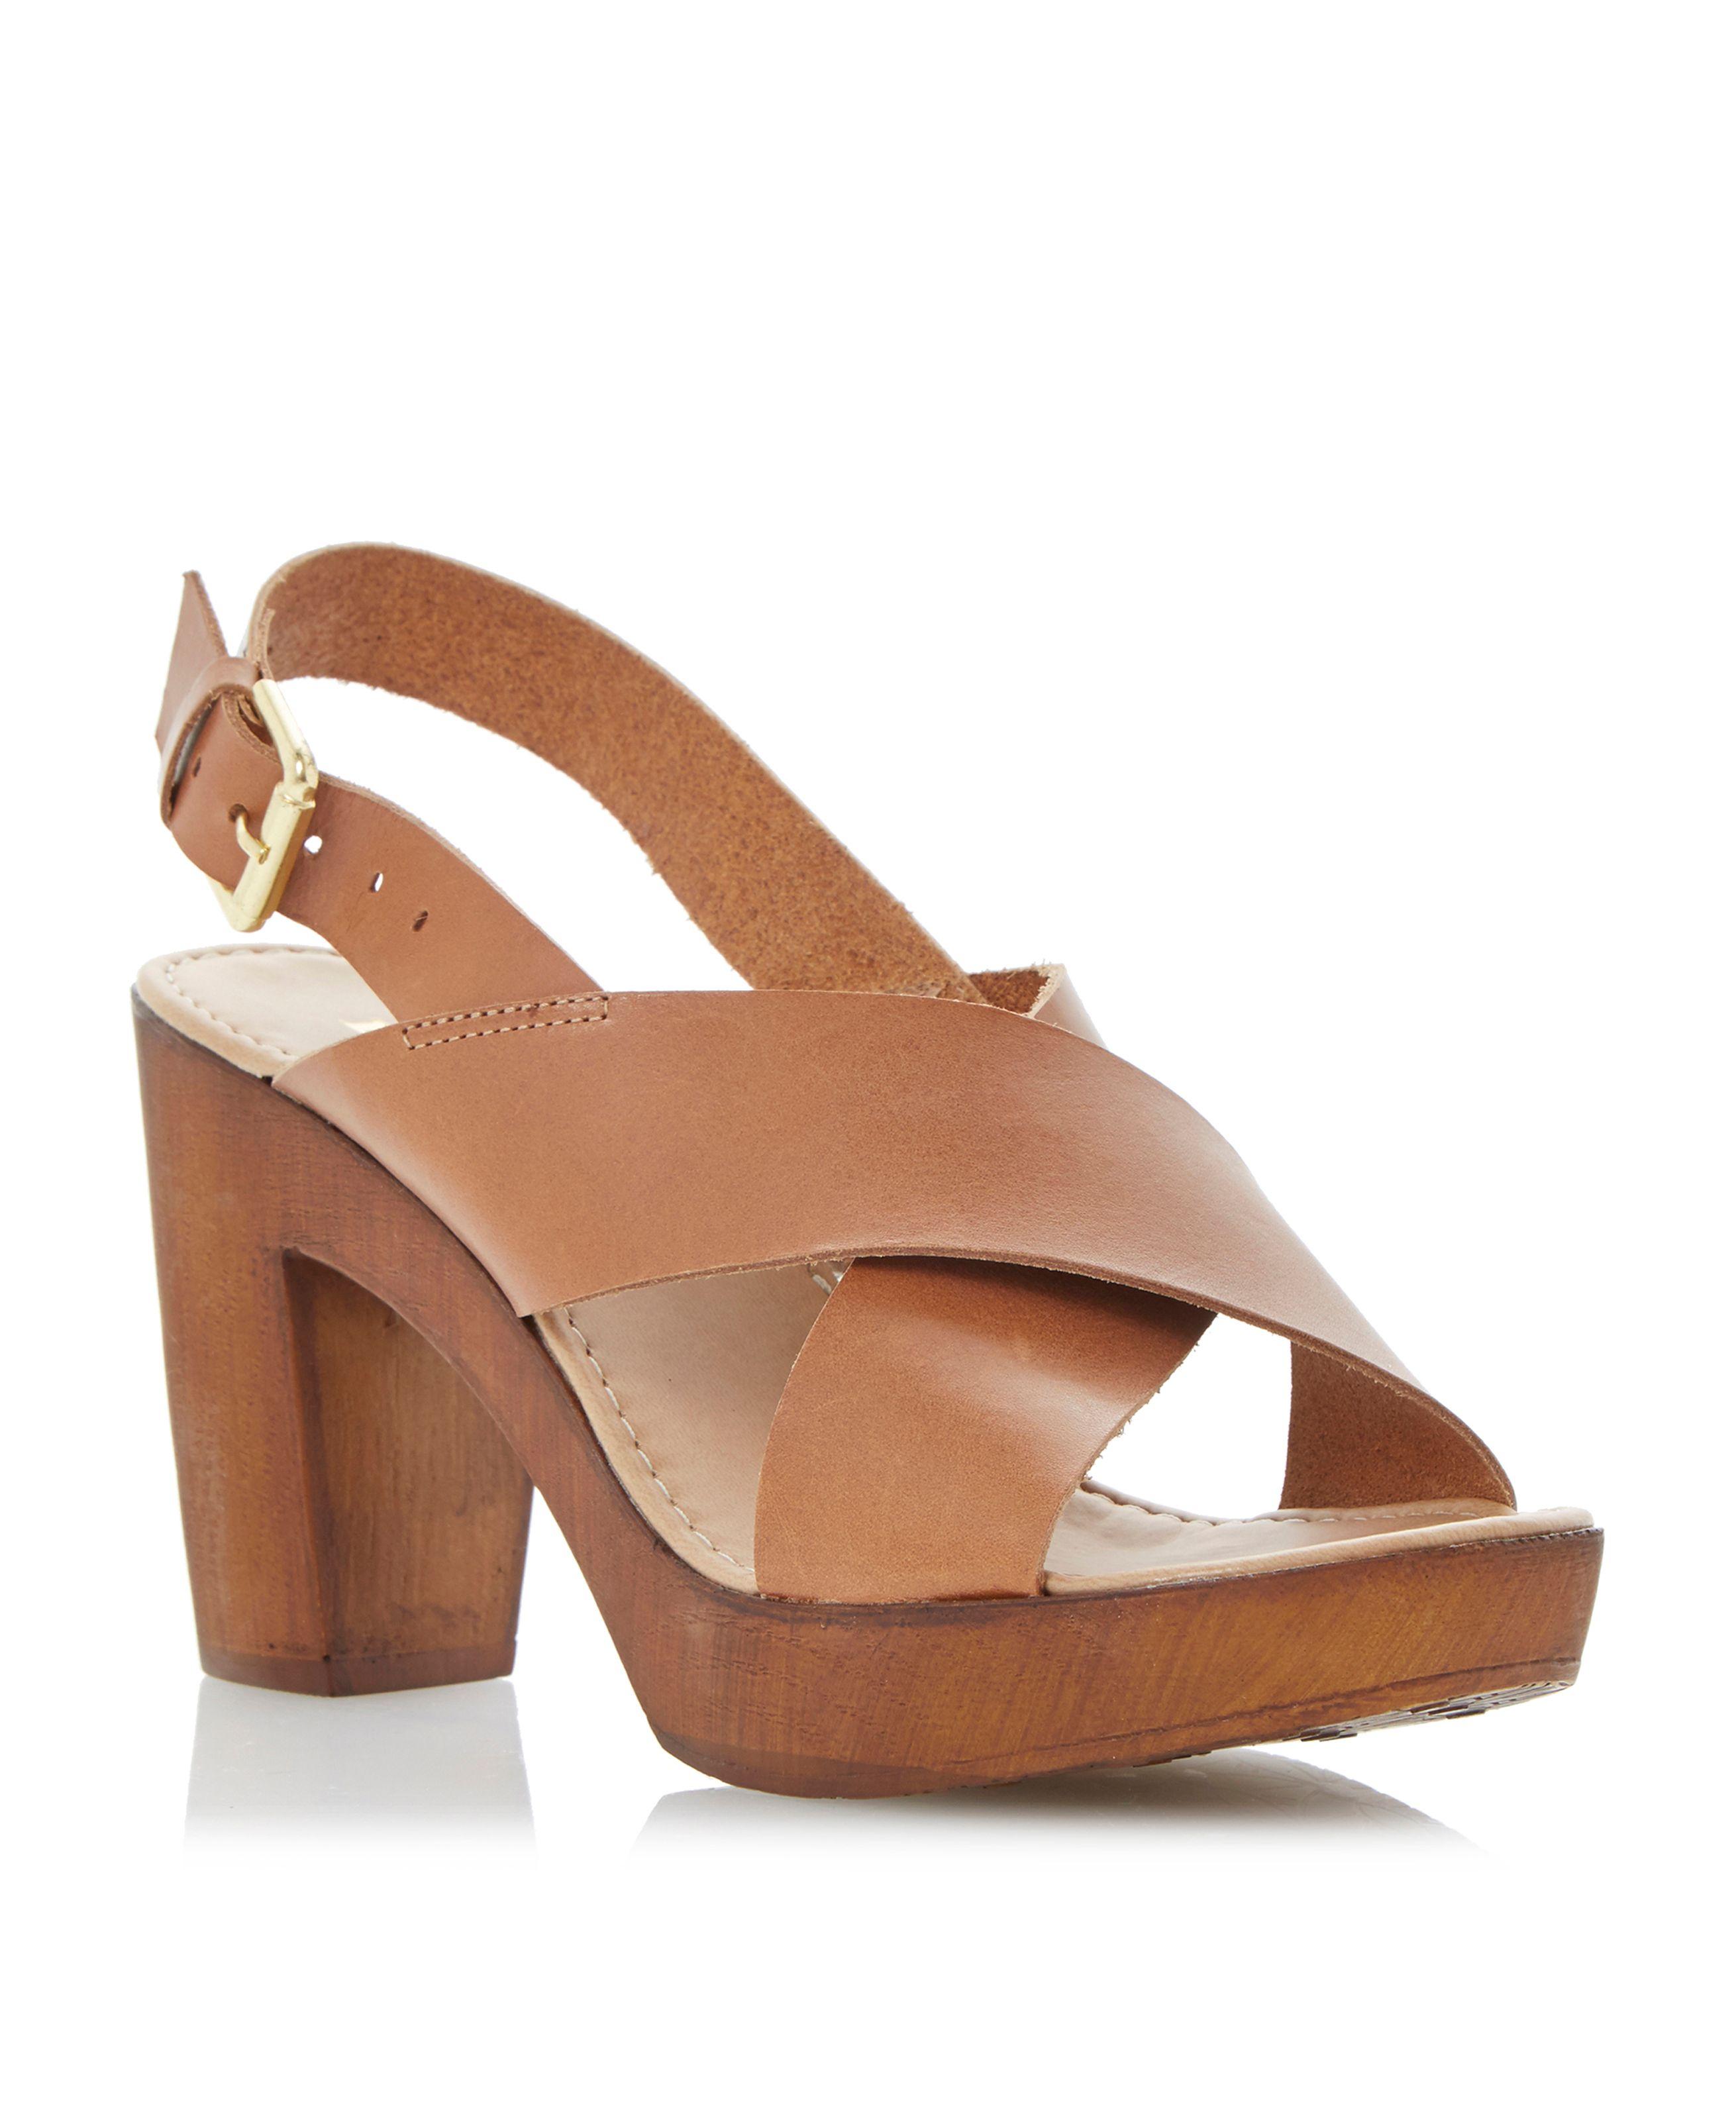 clog sandals for - 28 images - nelly sandal clog, lyst g